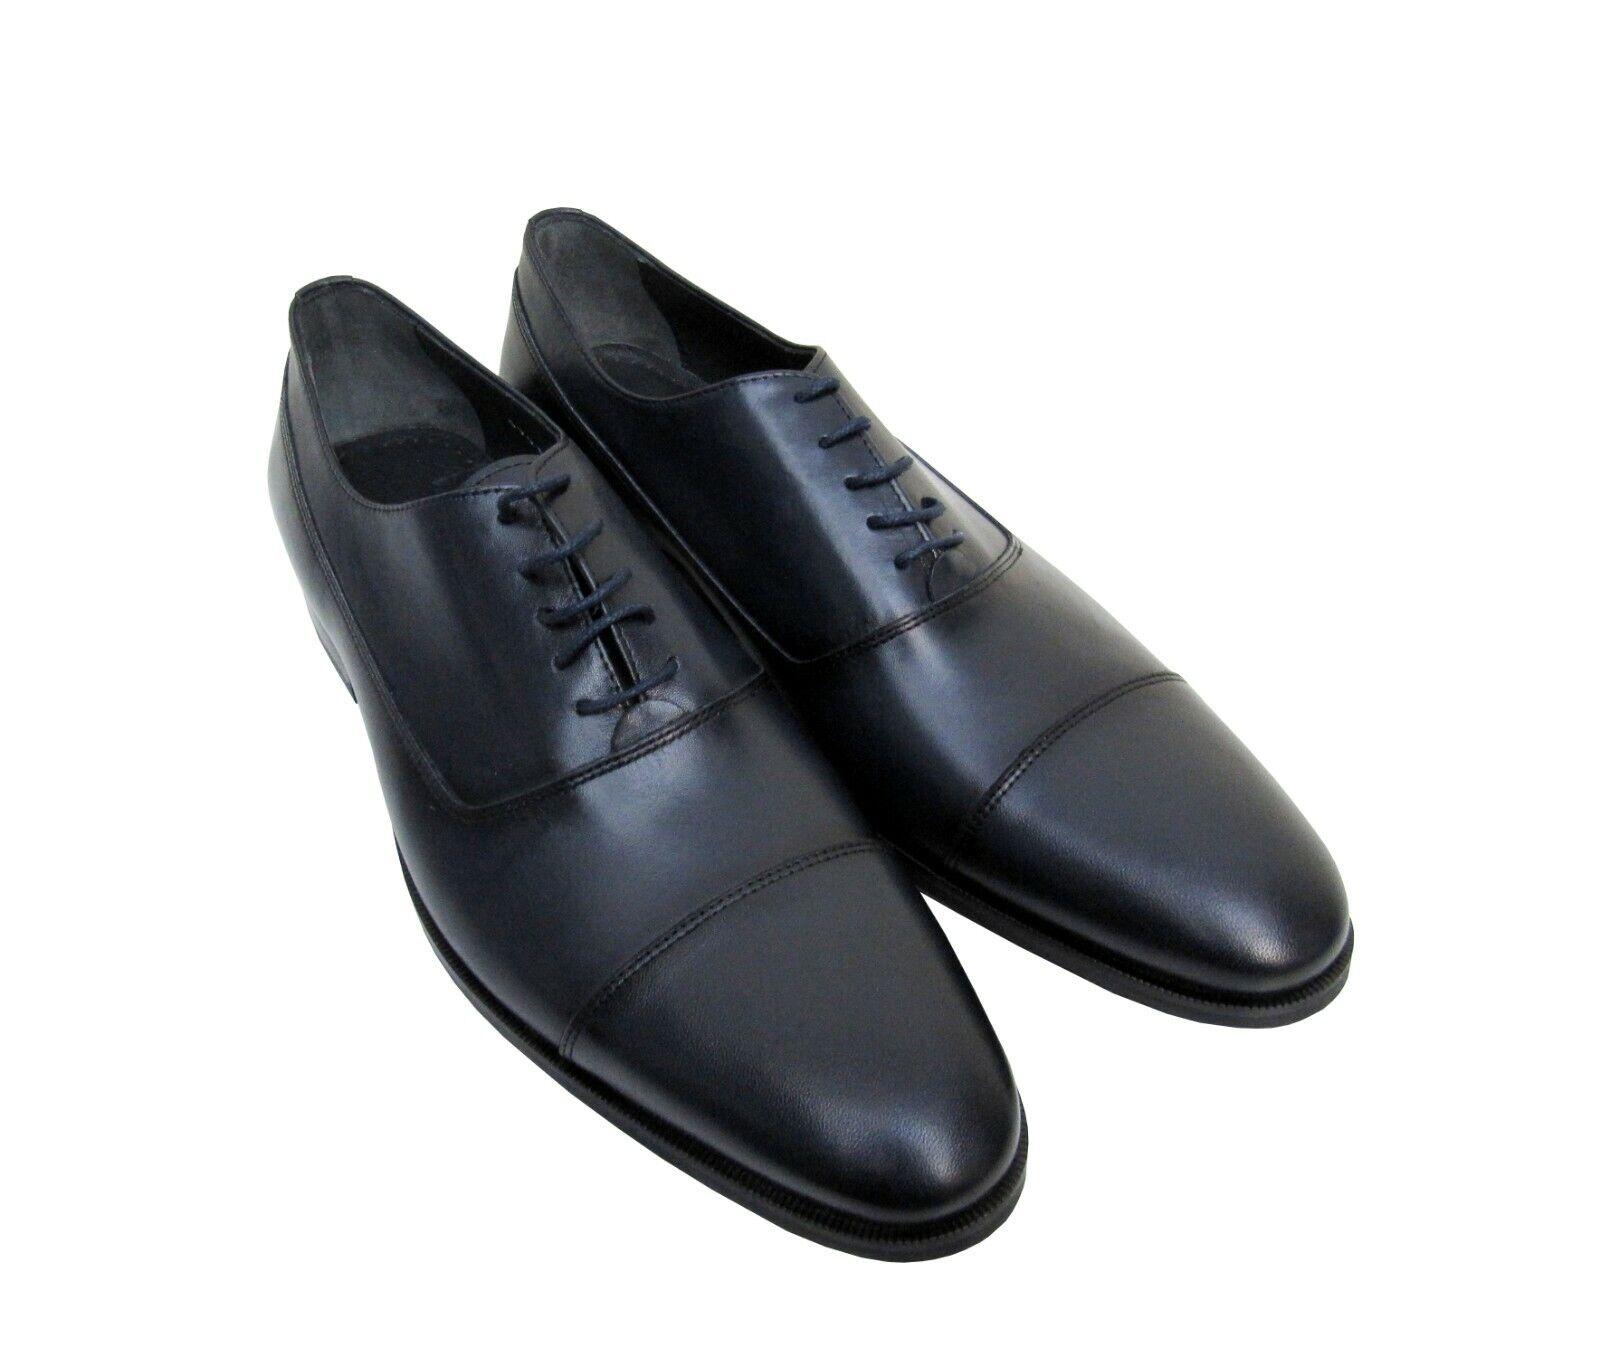 Herren leder Schuhe Business Business Business Freizeit Gr.39 Dunkelblau  1b5960